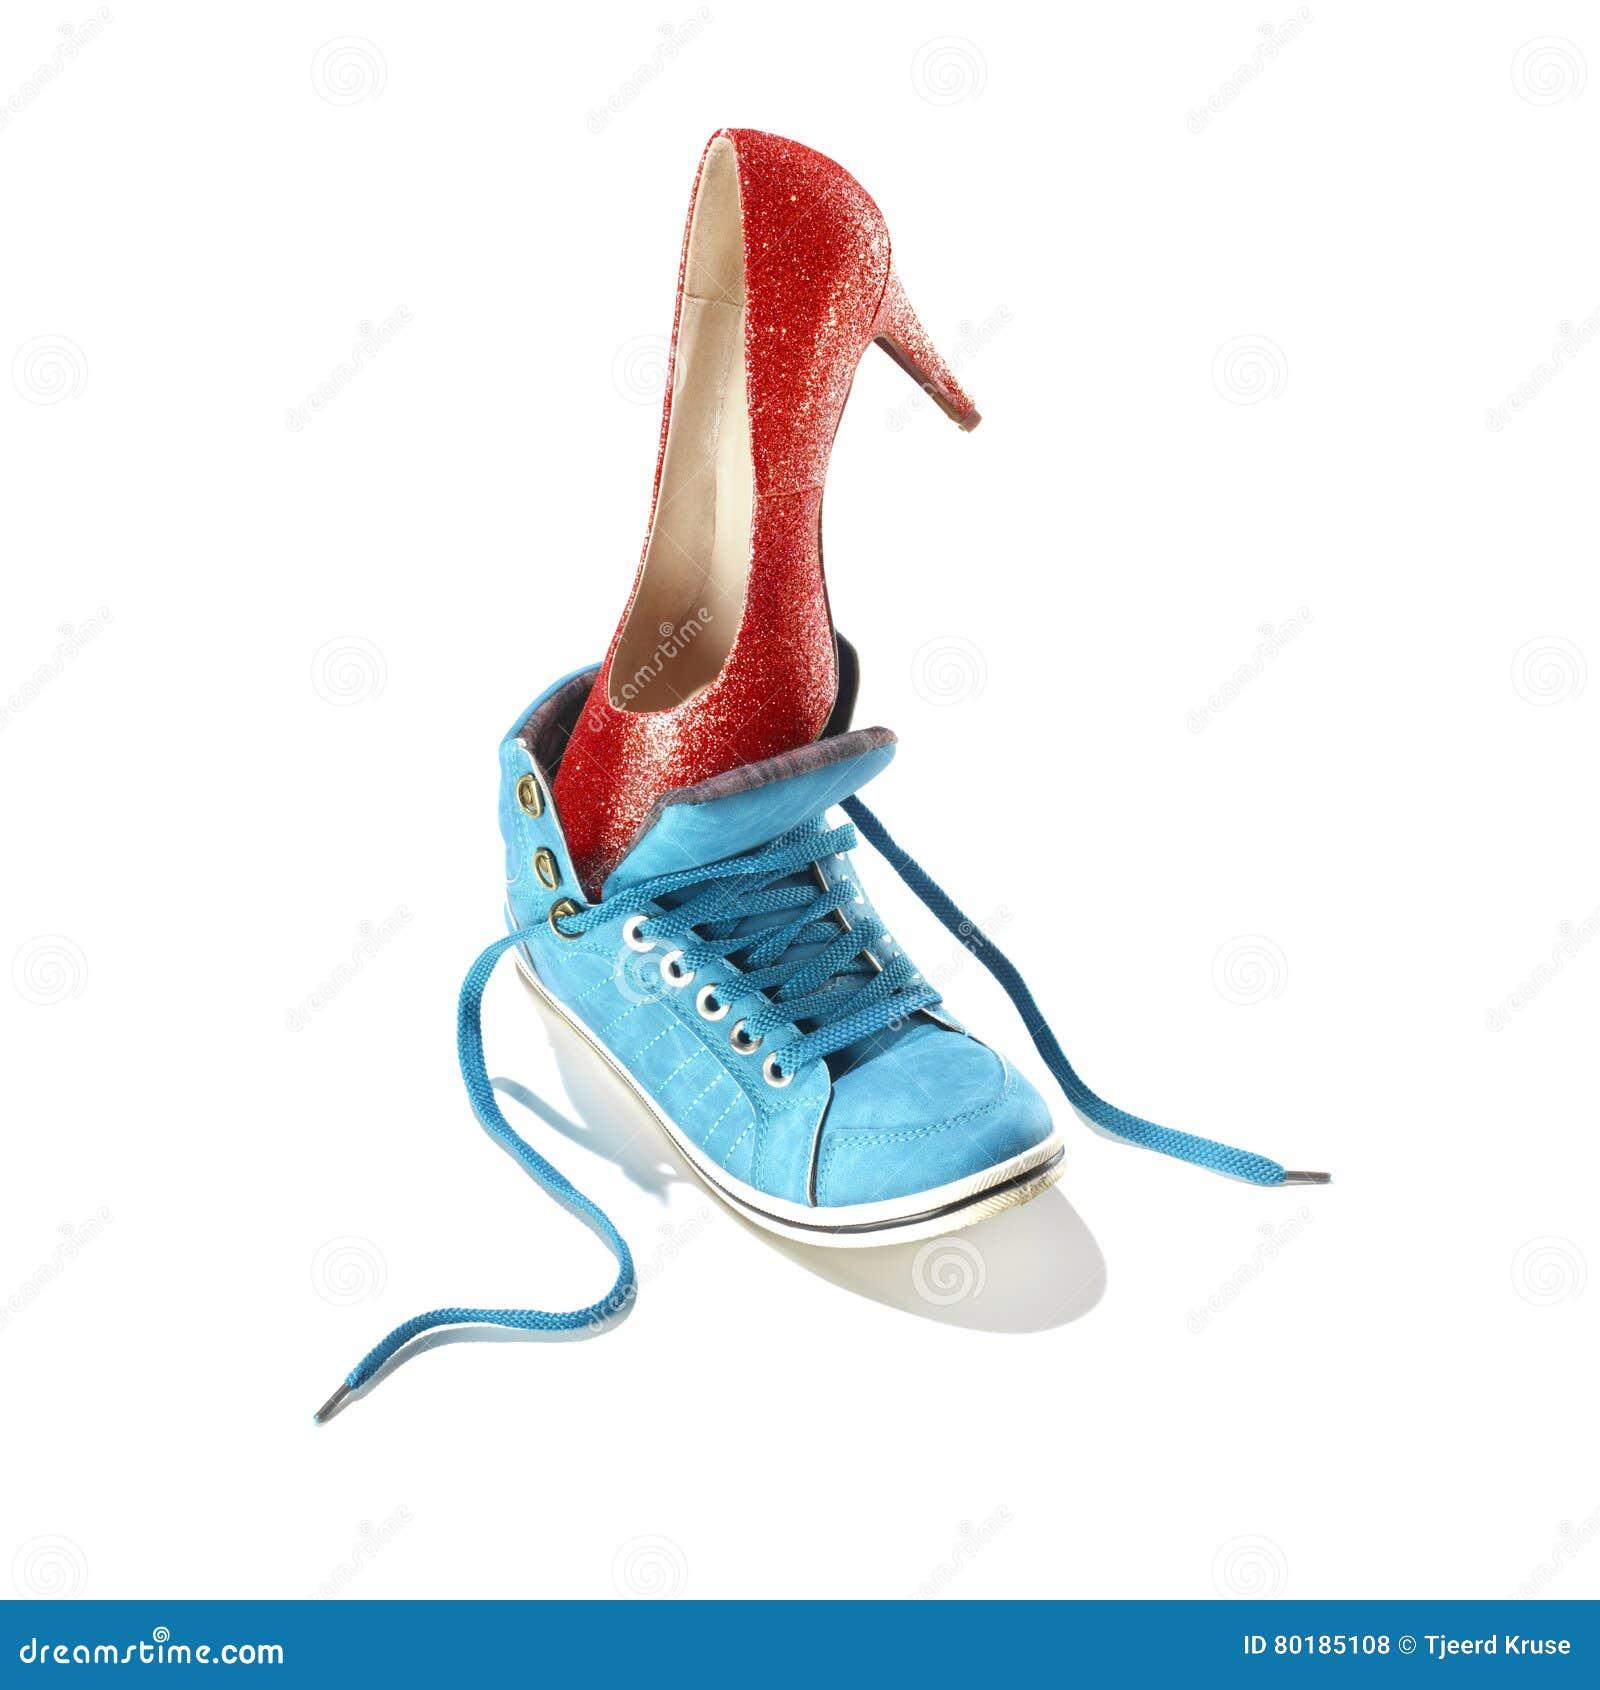 36cd3fb108c5 Classic stiletto high heels shoe in a red snake-print design put in a blue  sport shoe